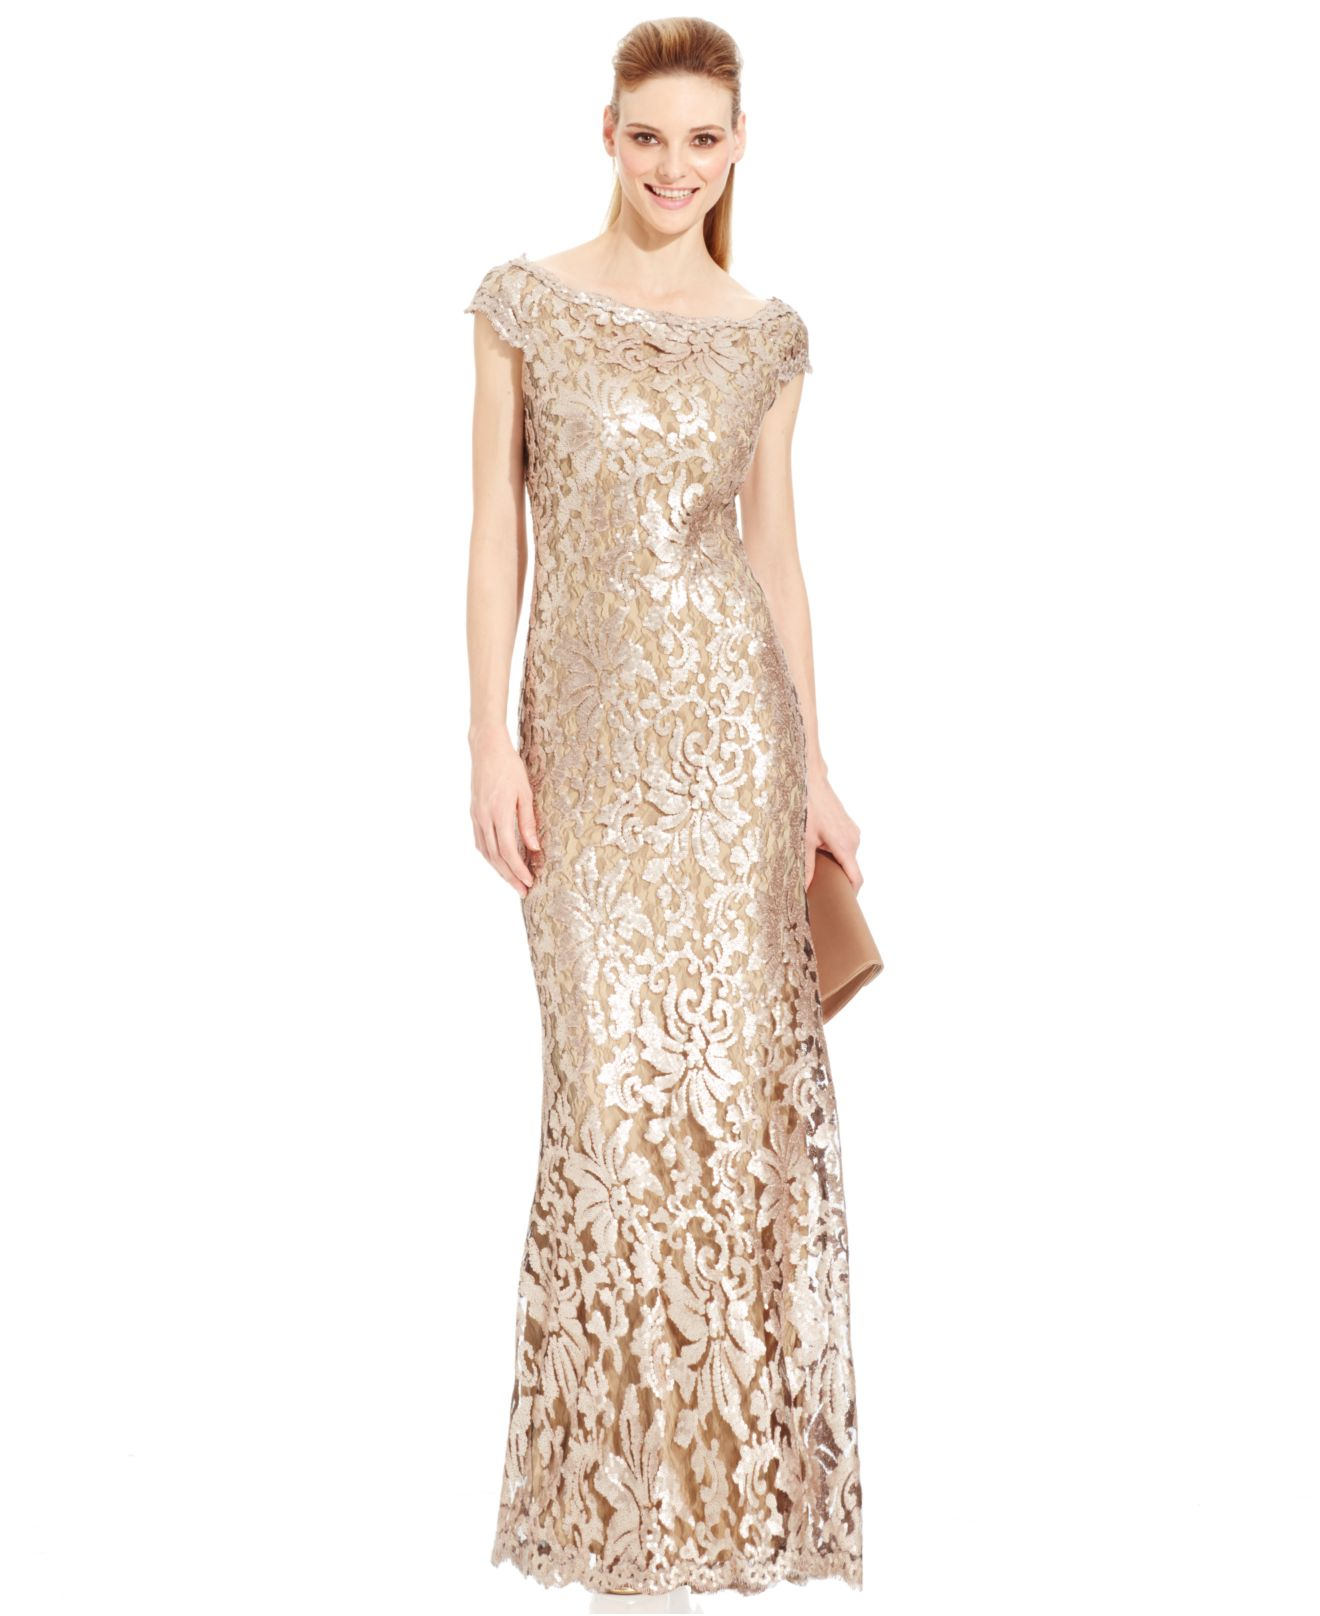 macy s wedding dresses macy's wedding dresses Ideas Macy Dresses For Weddings Macys All Women